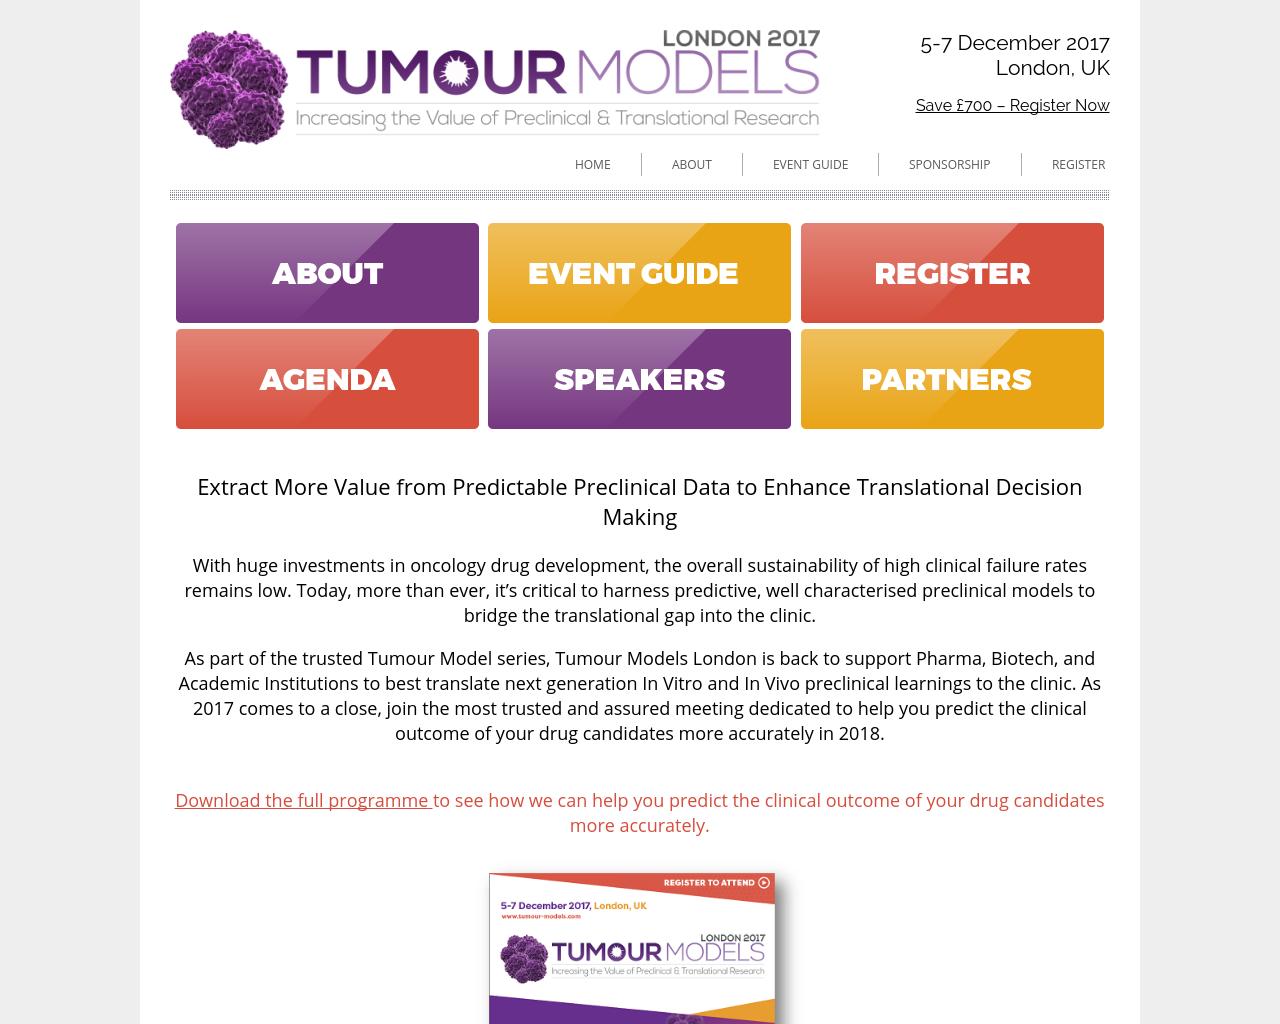 Tumour-Models-Europe-Advertising-Reviews-Pricing